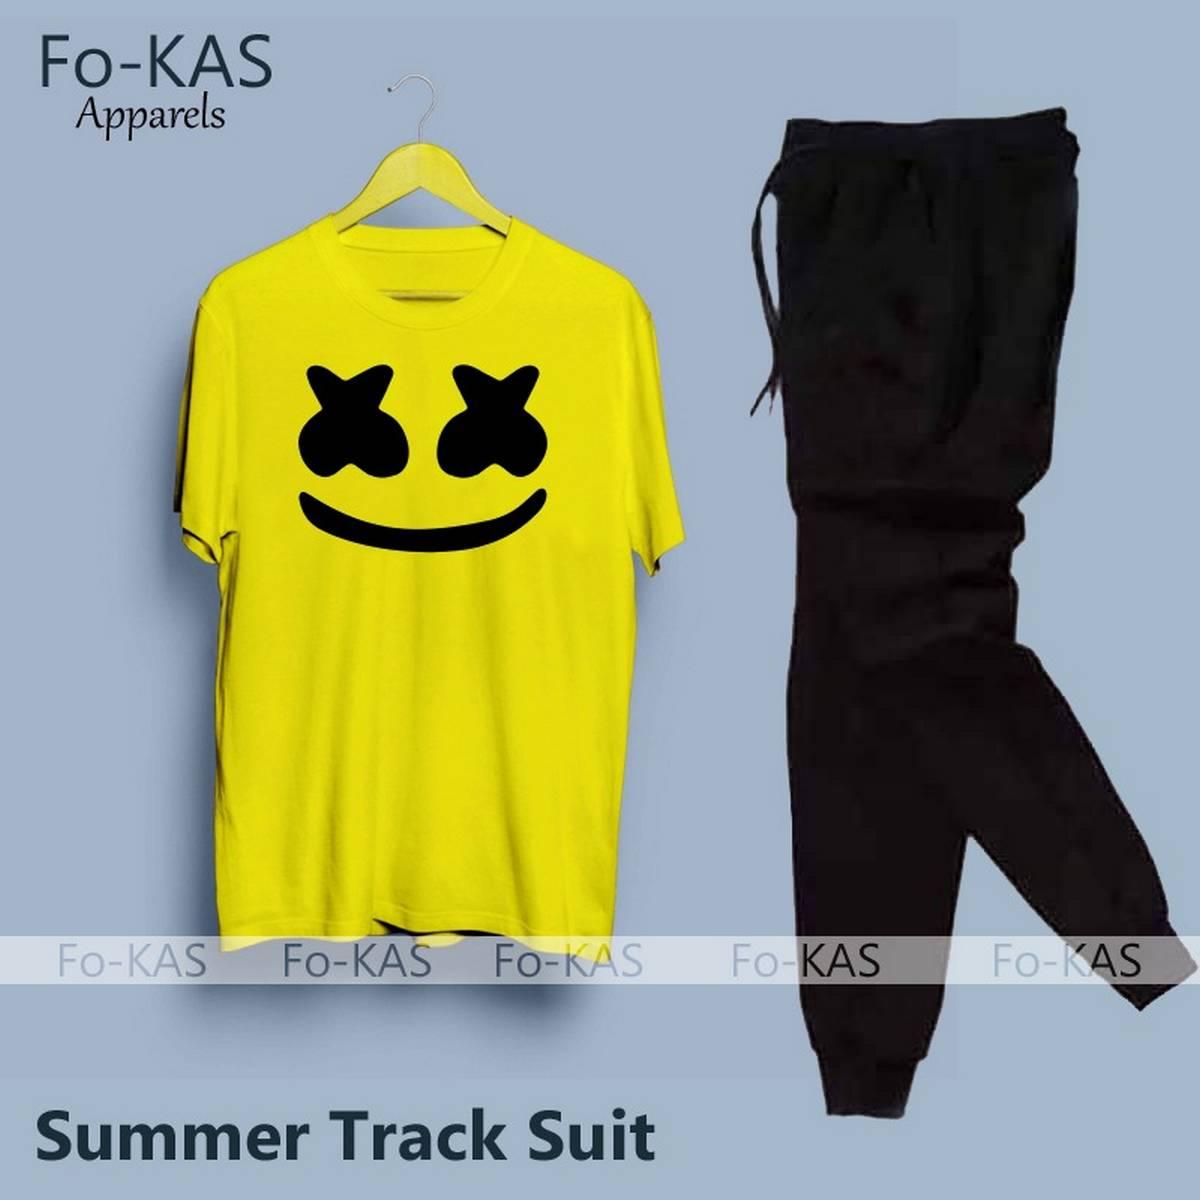 Marshmallow Printed Cotton Fabric T-Shirt & Trouser for Summer Elegant Tracksuit for _Men Trendy Wear